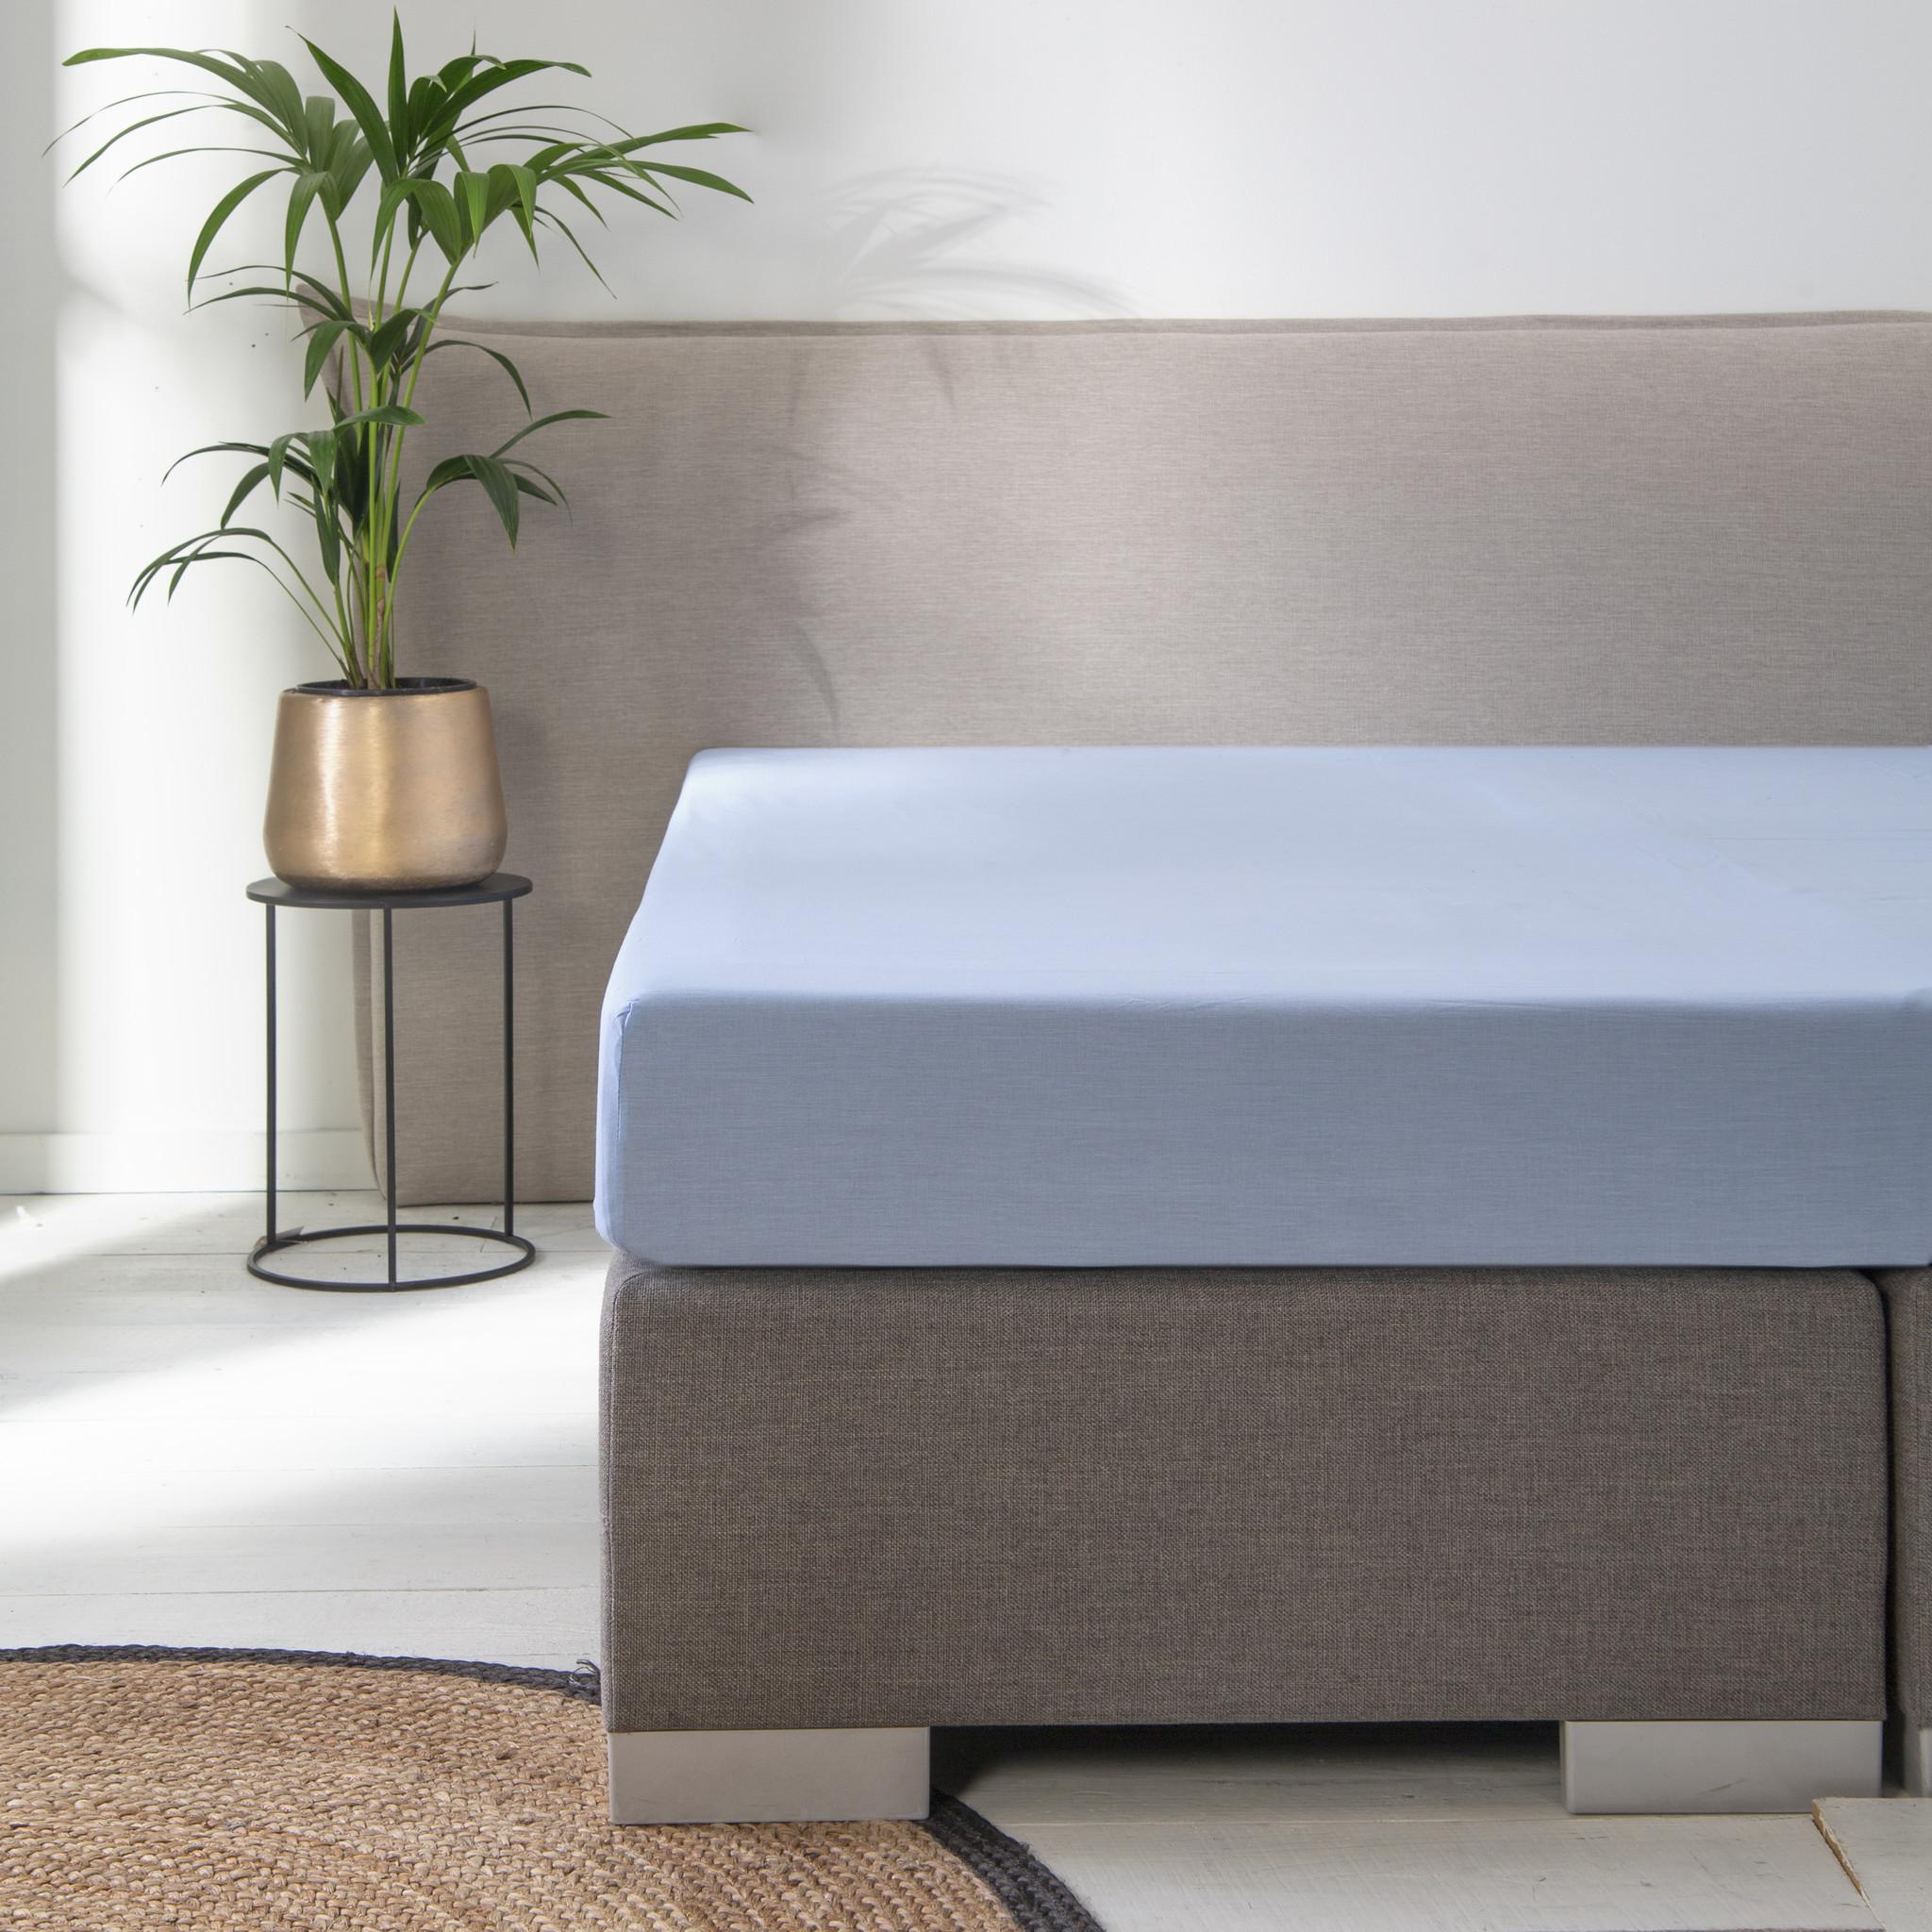 Luna Bedding 2-PACK: Luna Hoeslaken Blended Katoen - Blauw 90 x 200 cm